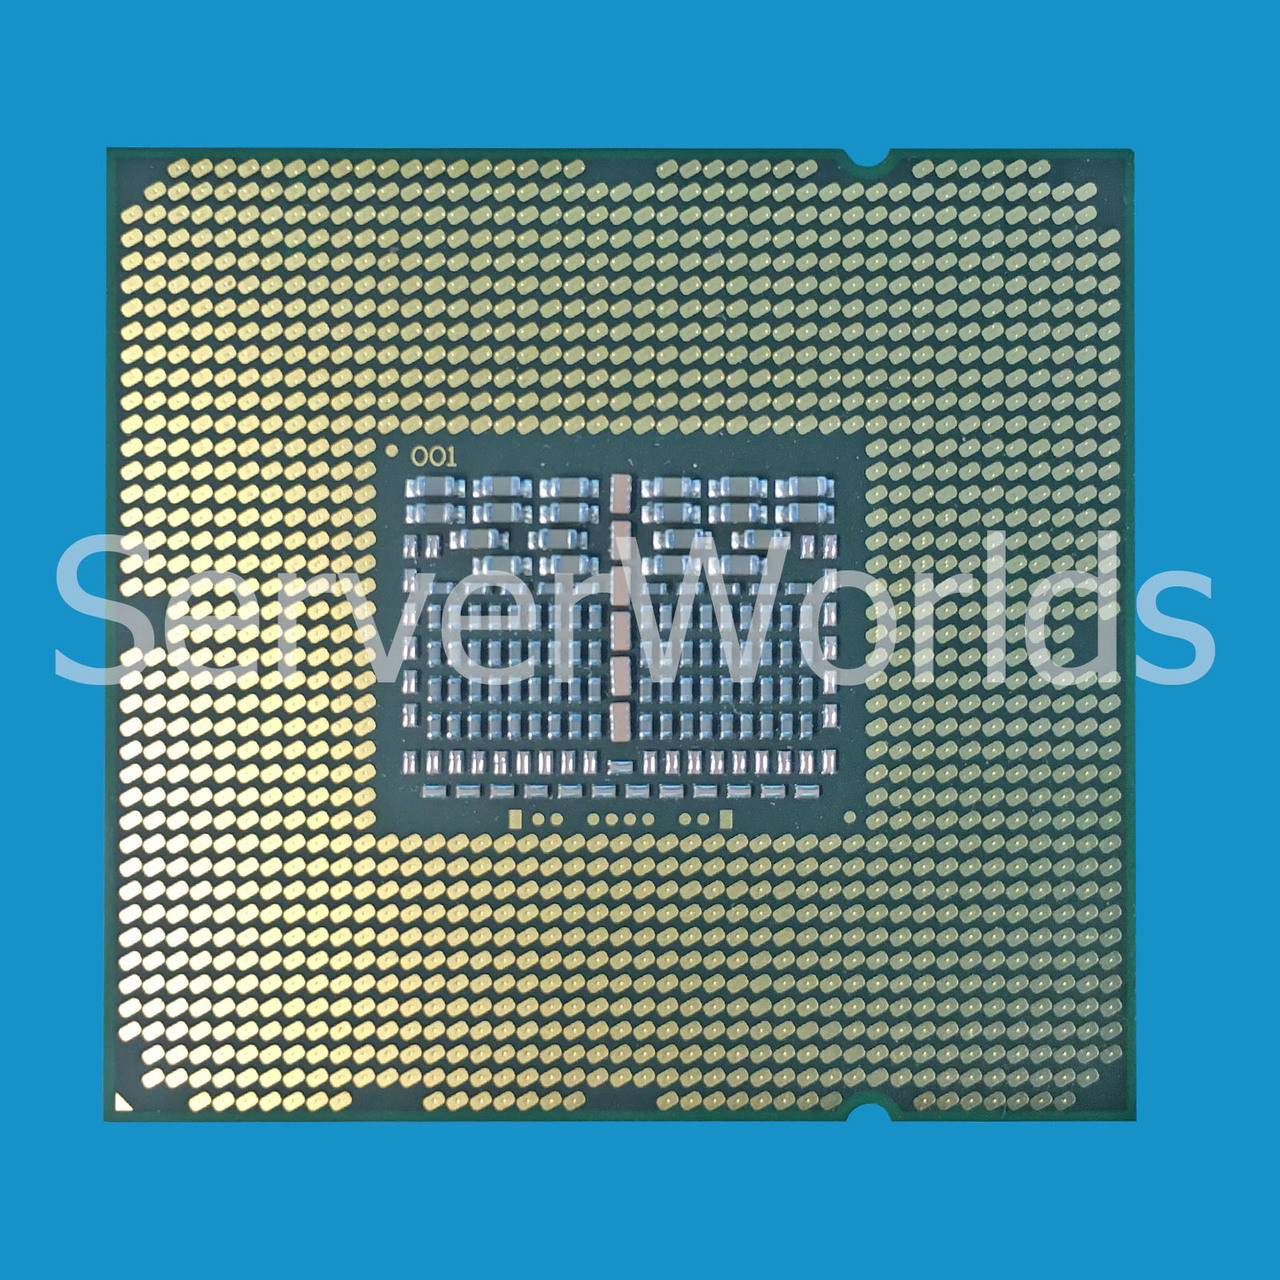 Intel Xeon 2.26GHz L5520 Quad Core QC Processor SLBFA Laptop ...